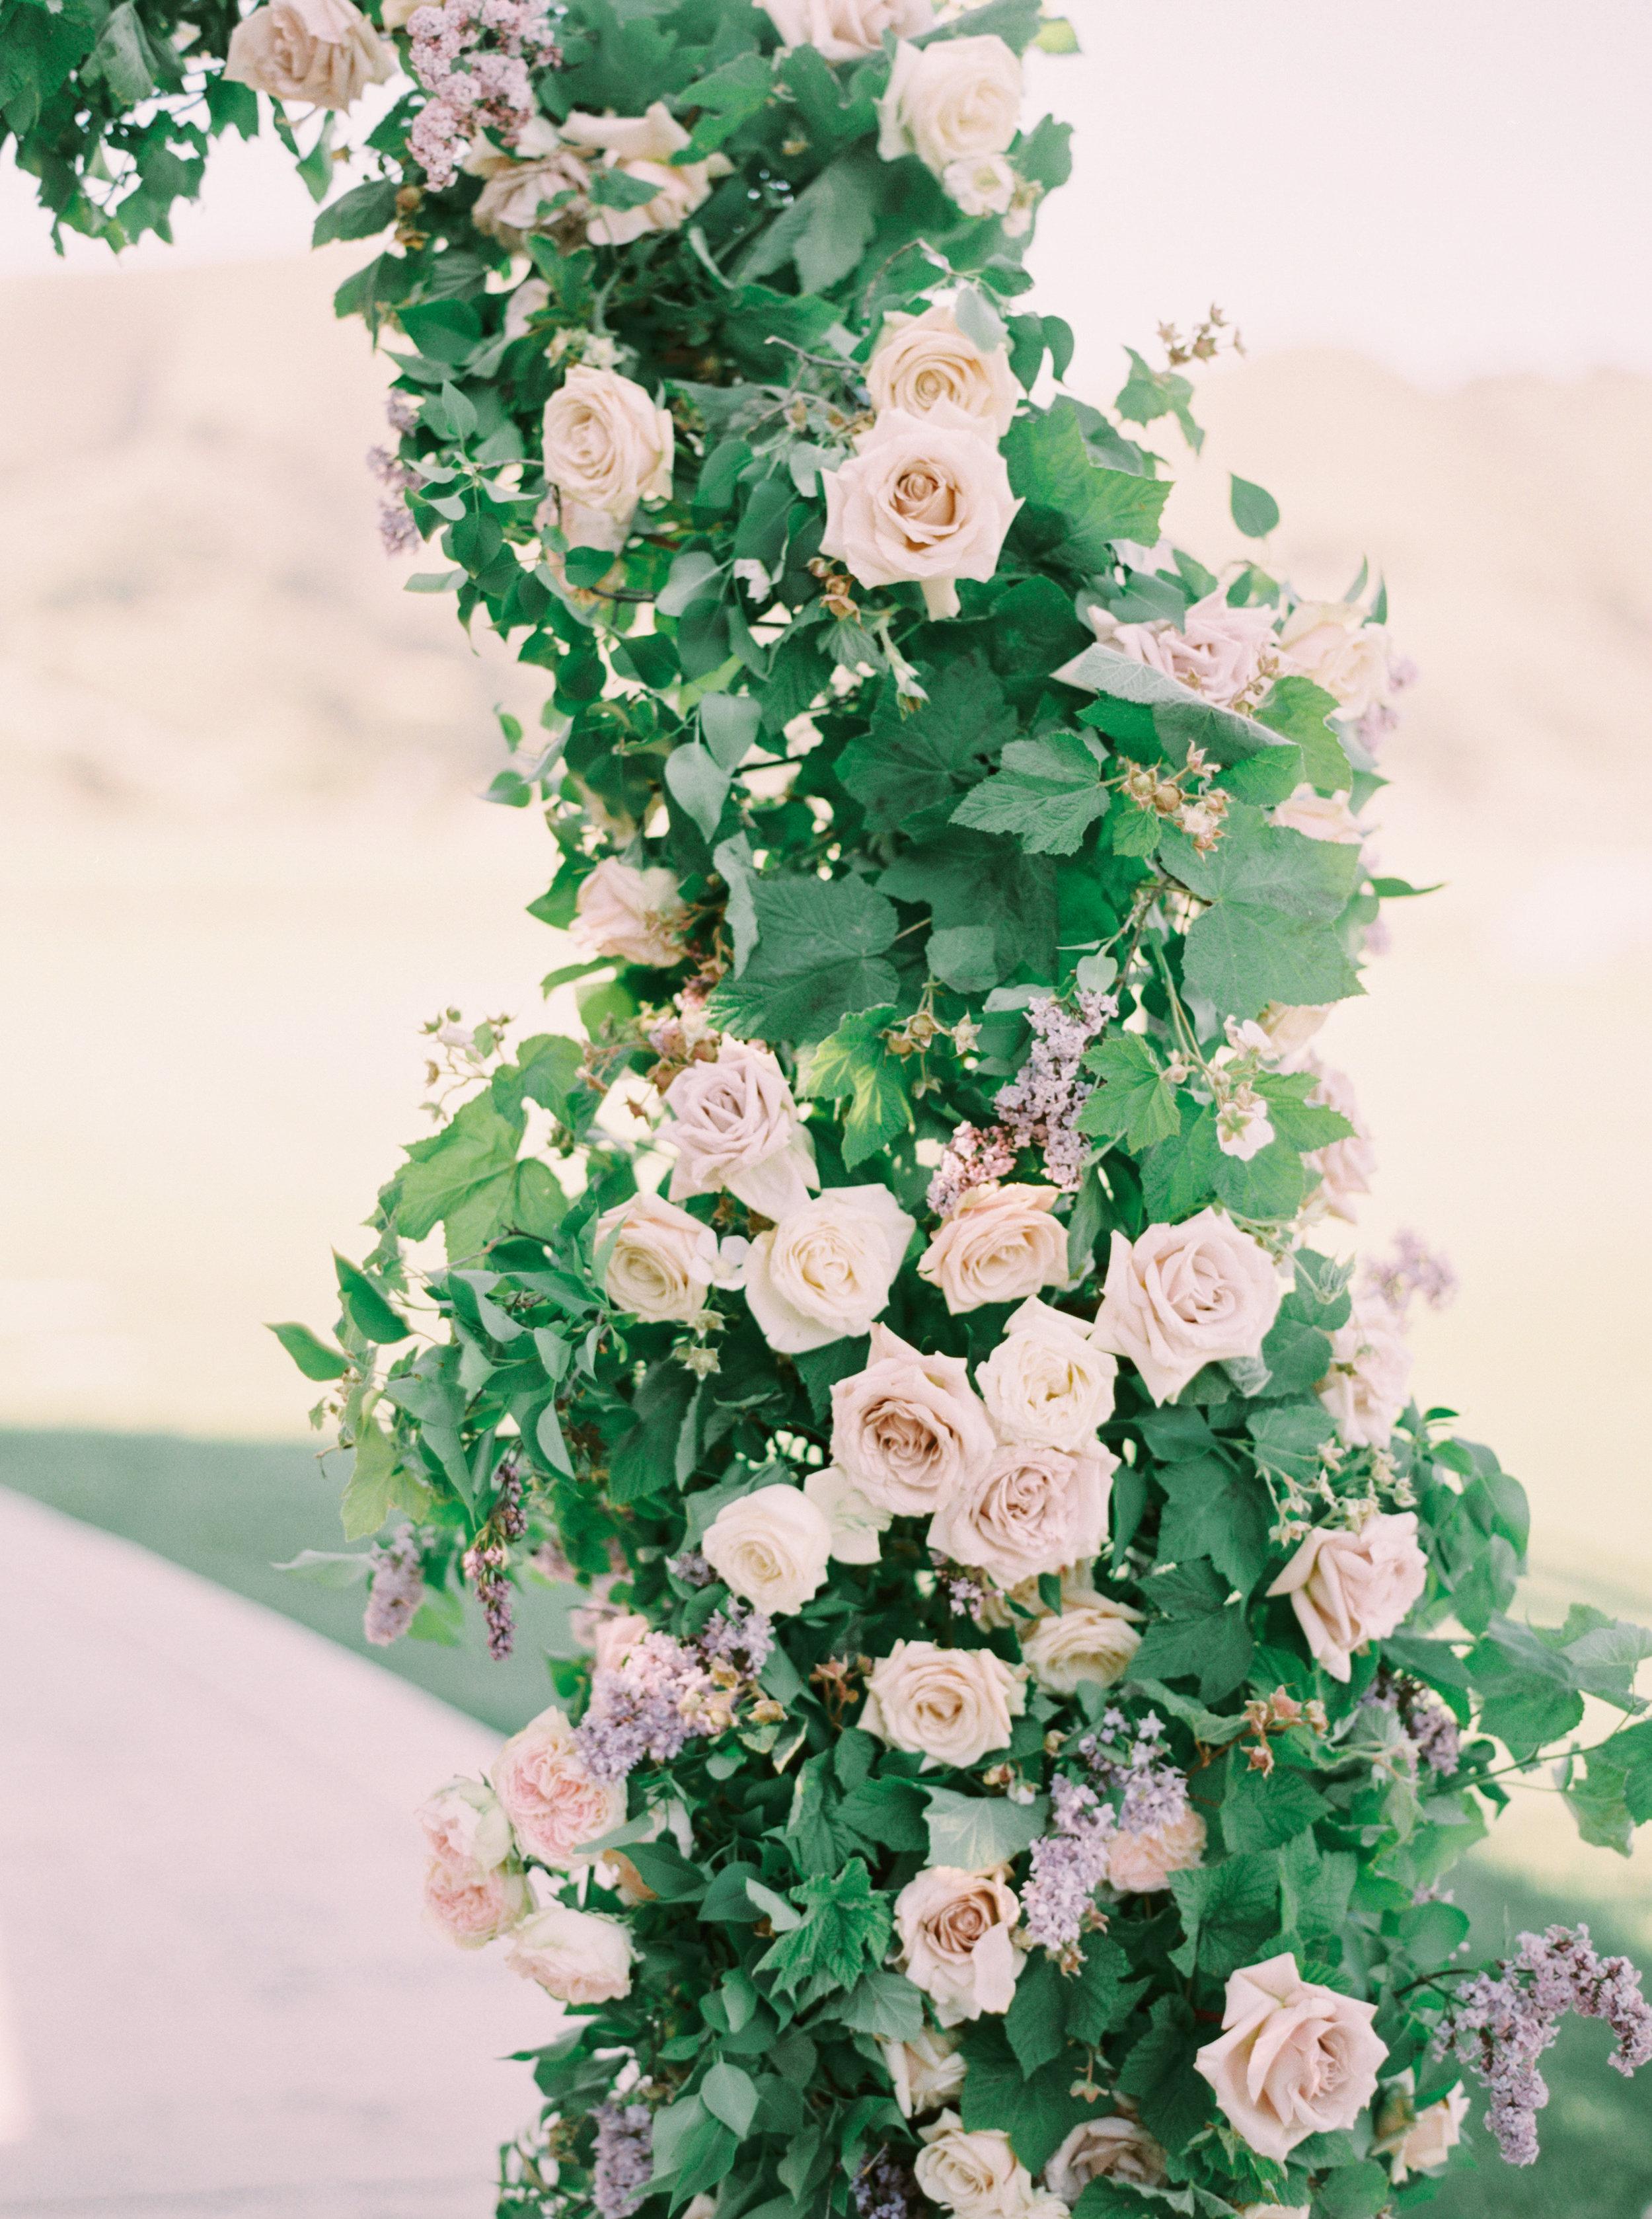 This-Love-of-Yours-Kirigin-Cellars-Flower-Arch-Styled-Shoot-098.jpg